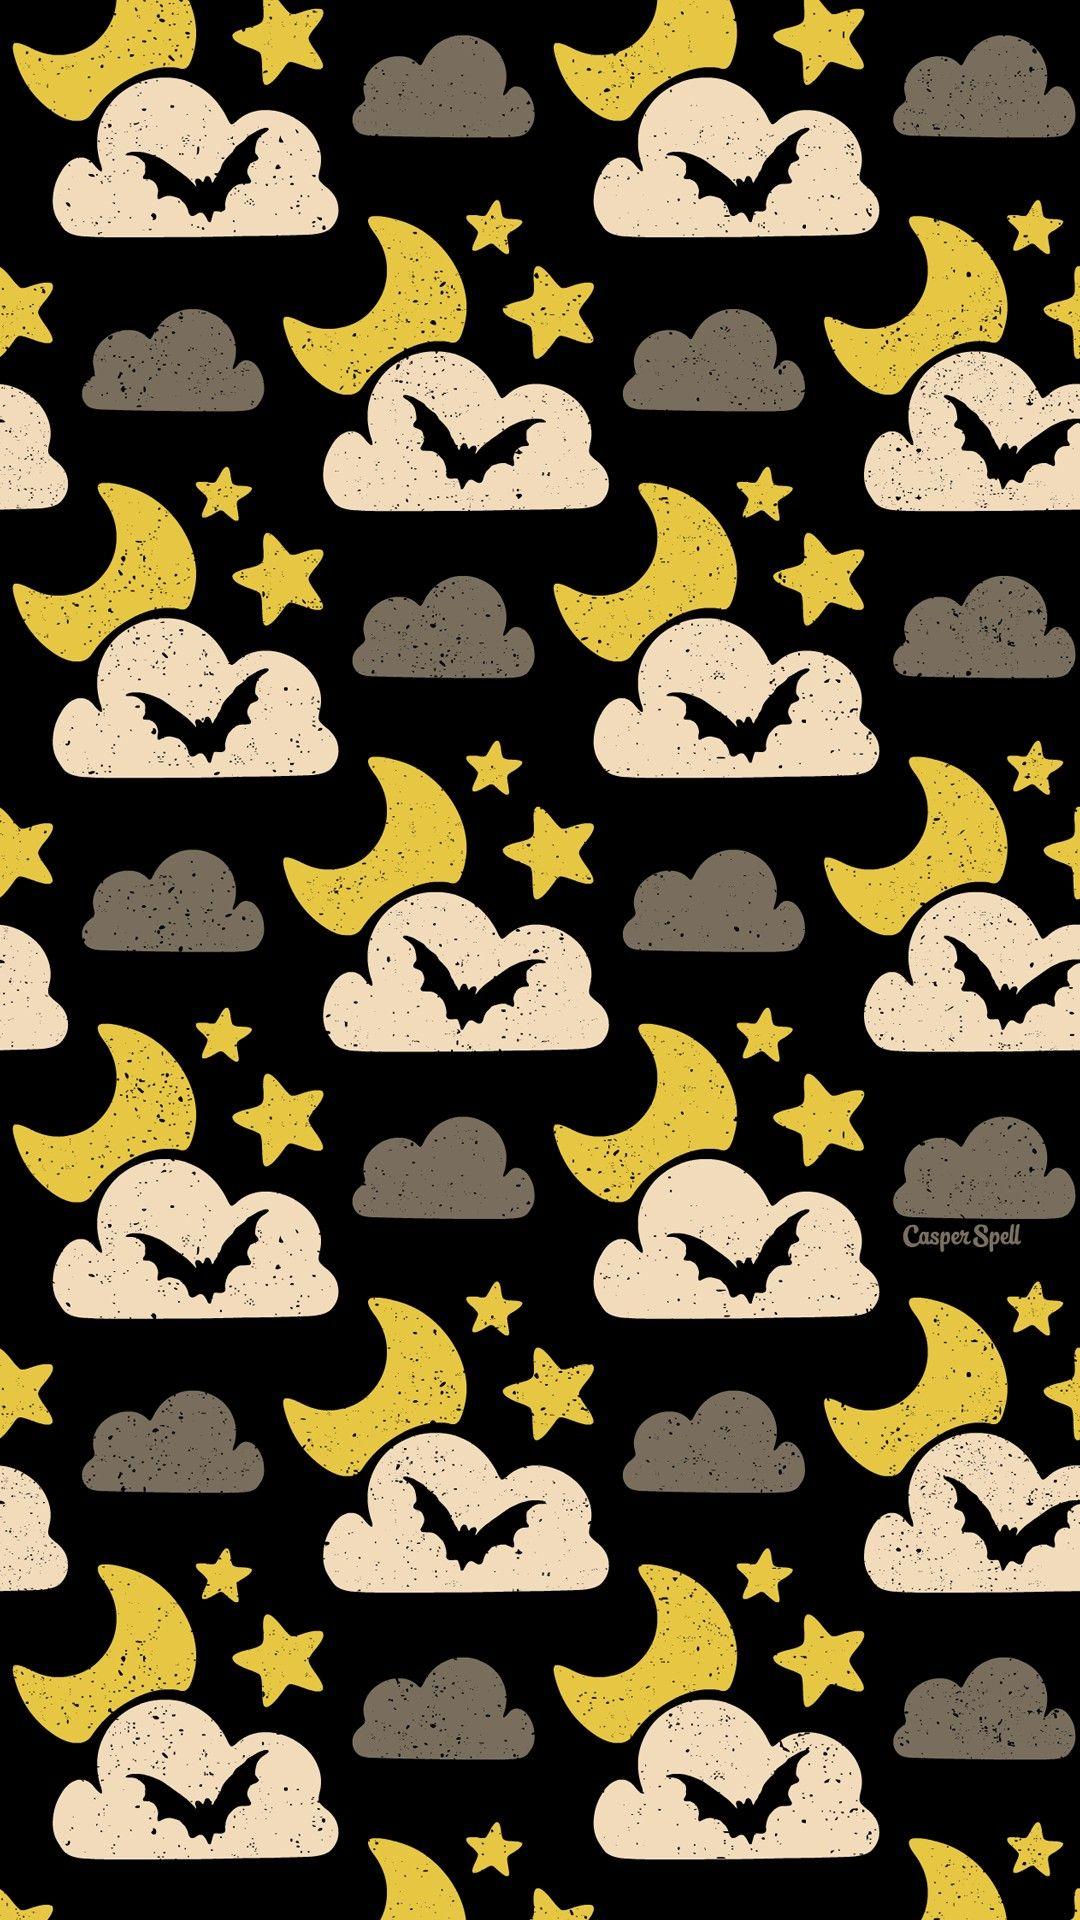 Halloween Nocturnal Bat Night Repeat Pattern Wallpaper Screensaver Cute Creepy Spooky Macabre Art Desig Halloween Wallpaper Pretty Wallpapers Pattern Wallpaper